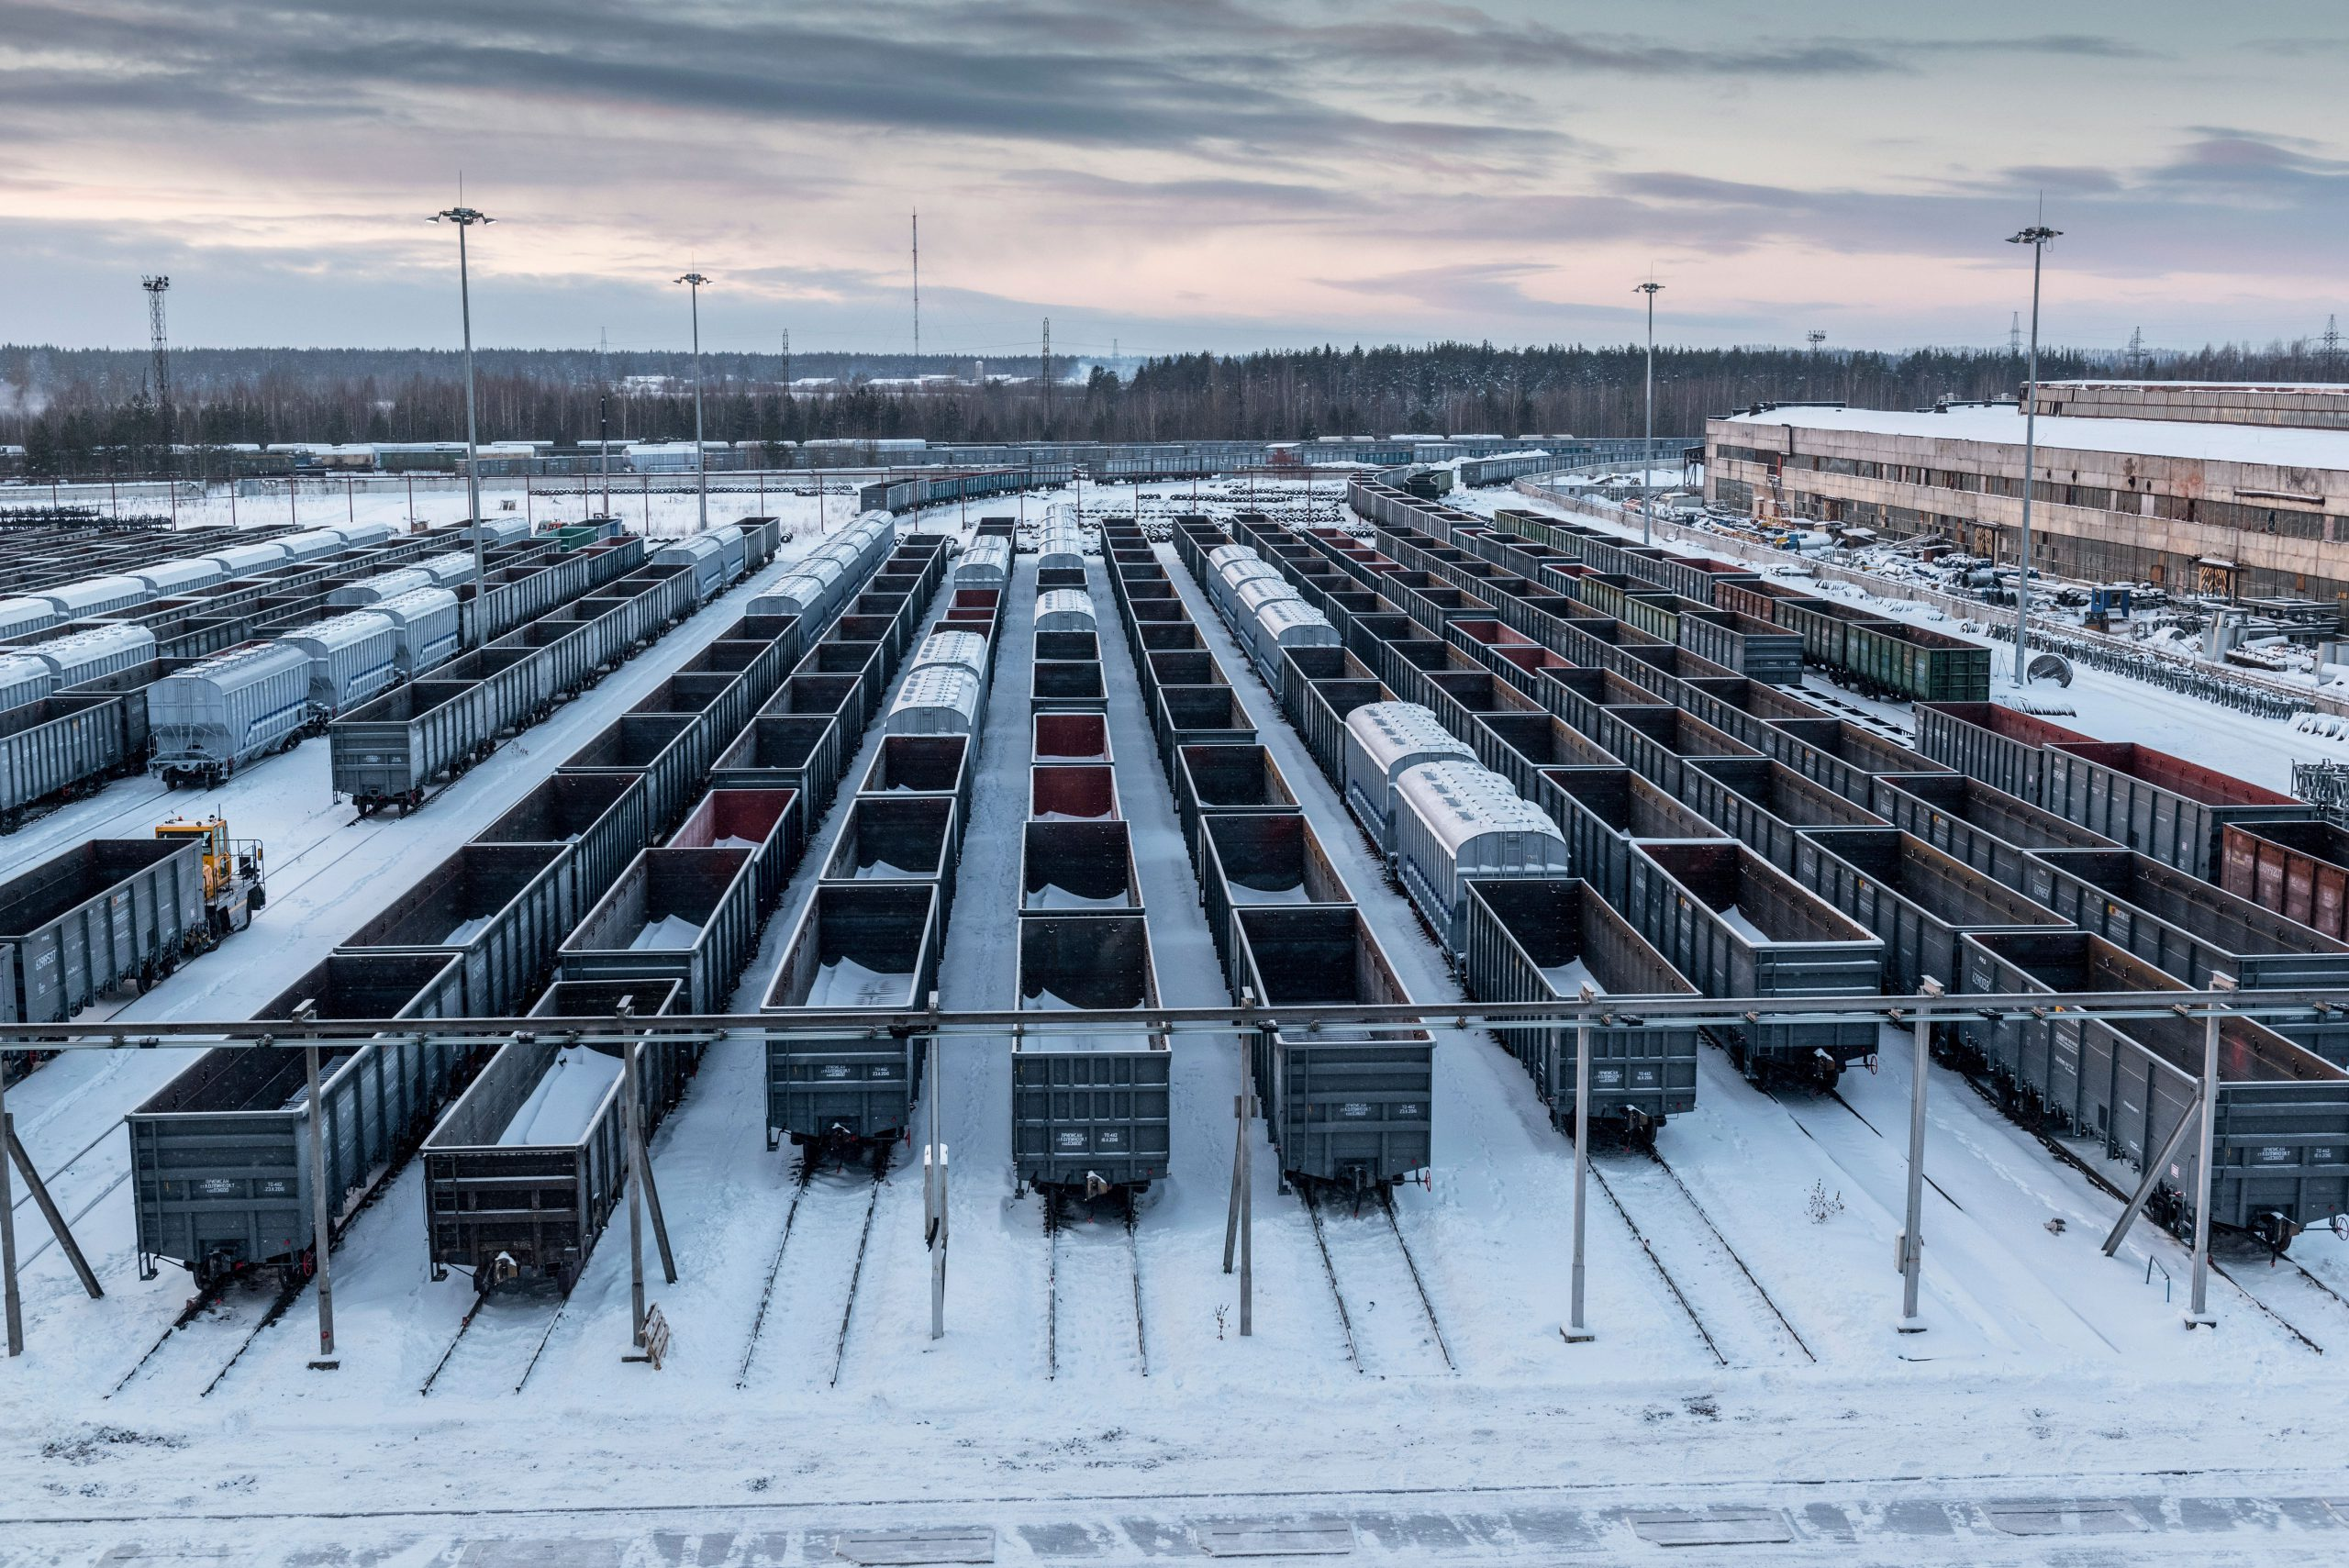 Renovar los ferrocarriles rusos